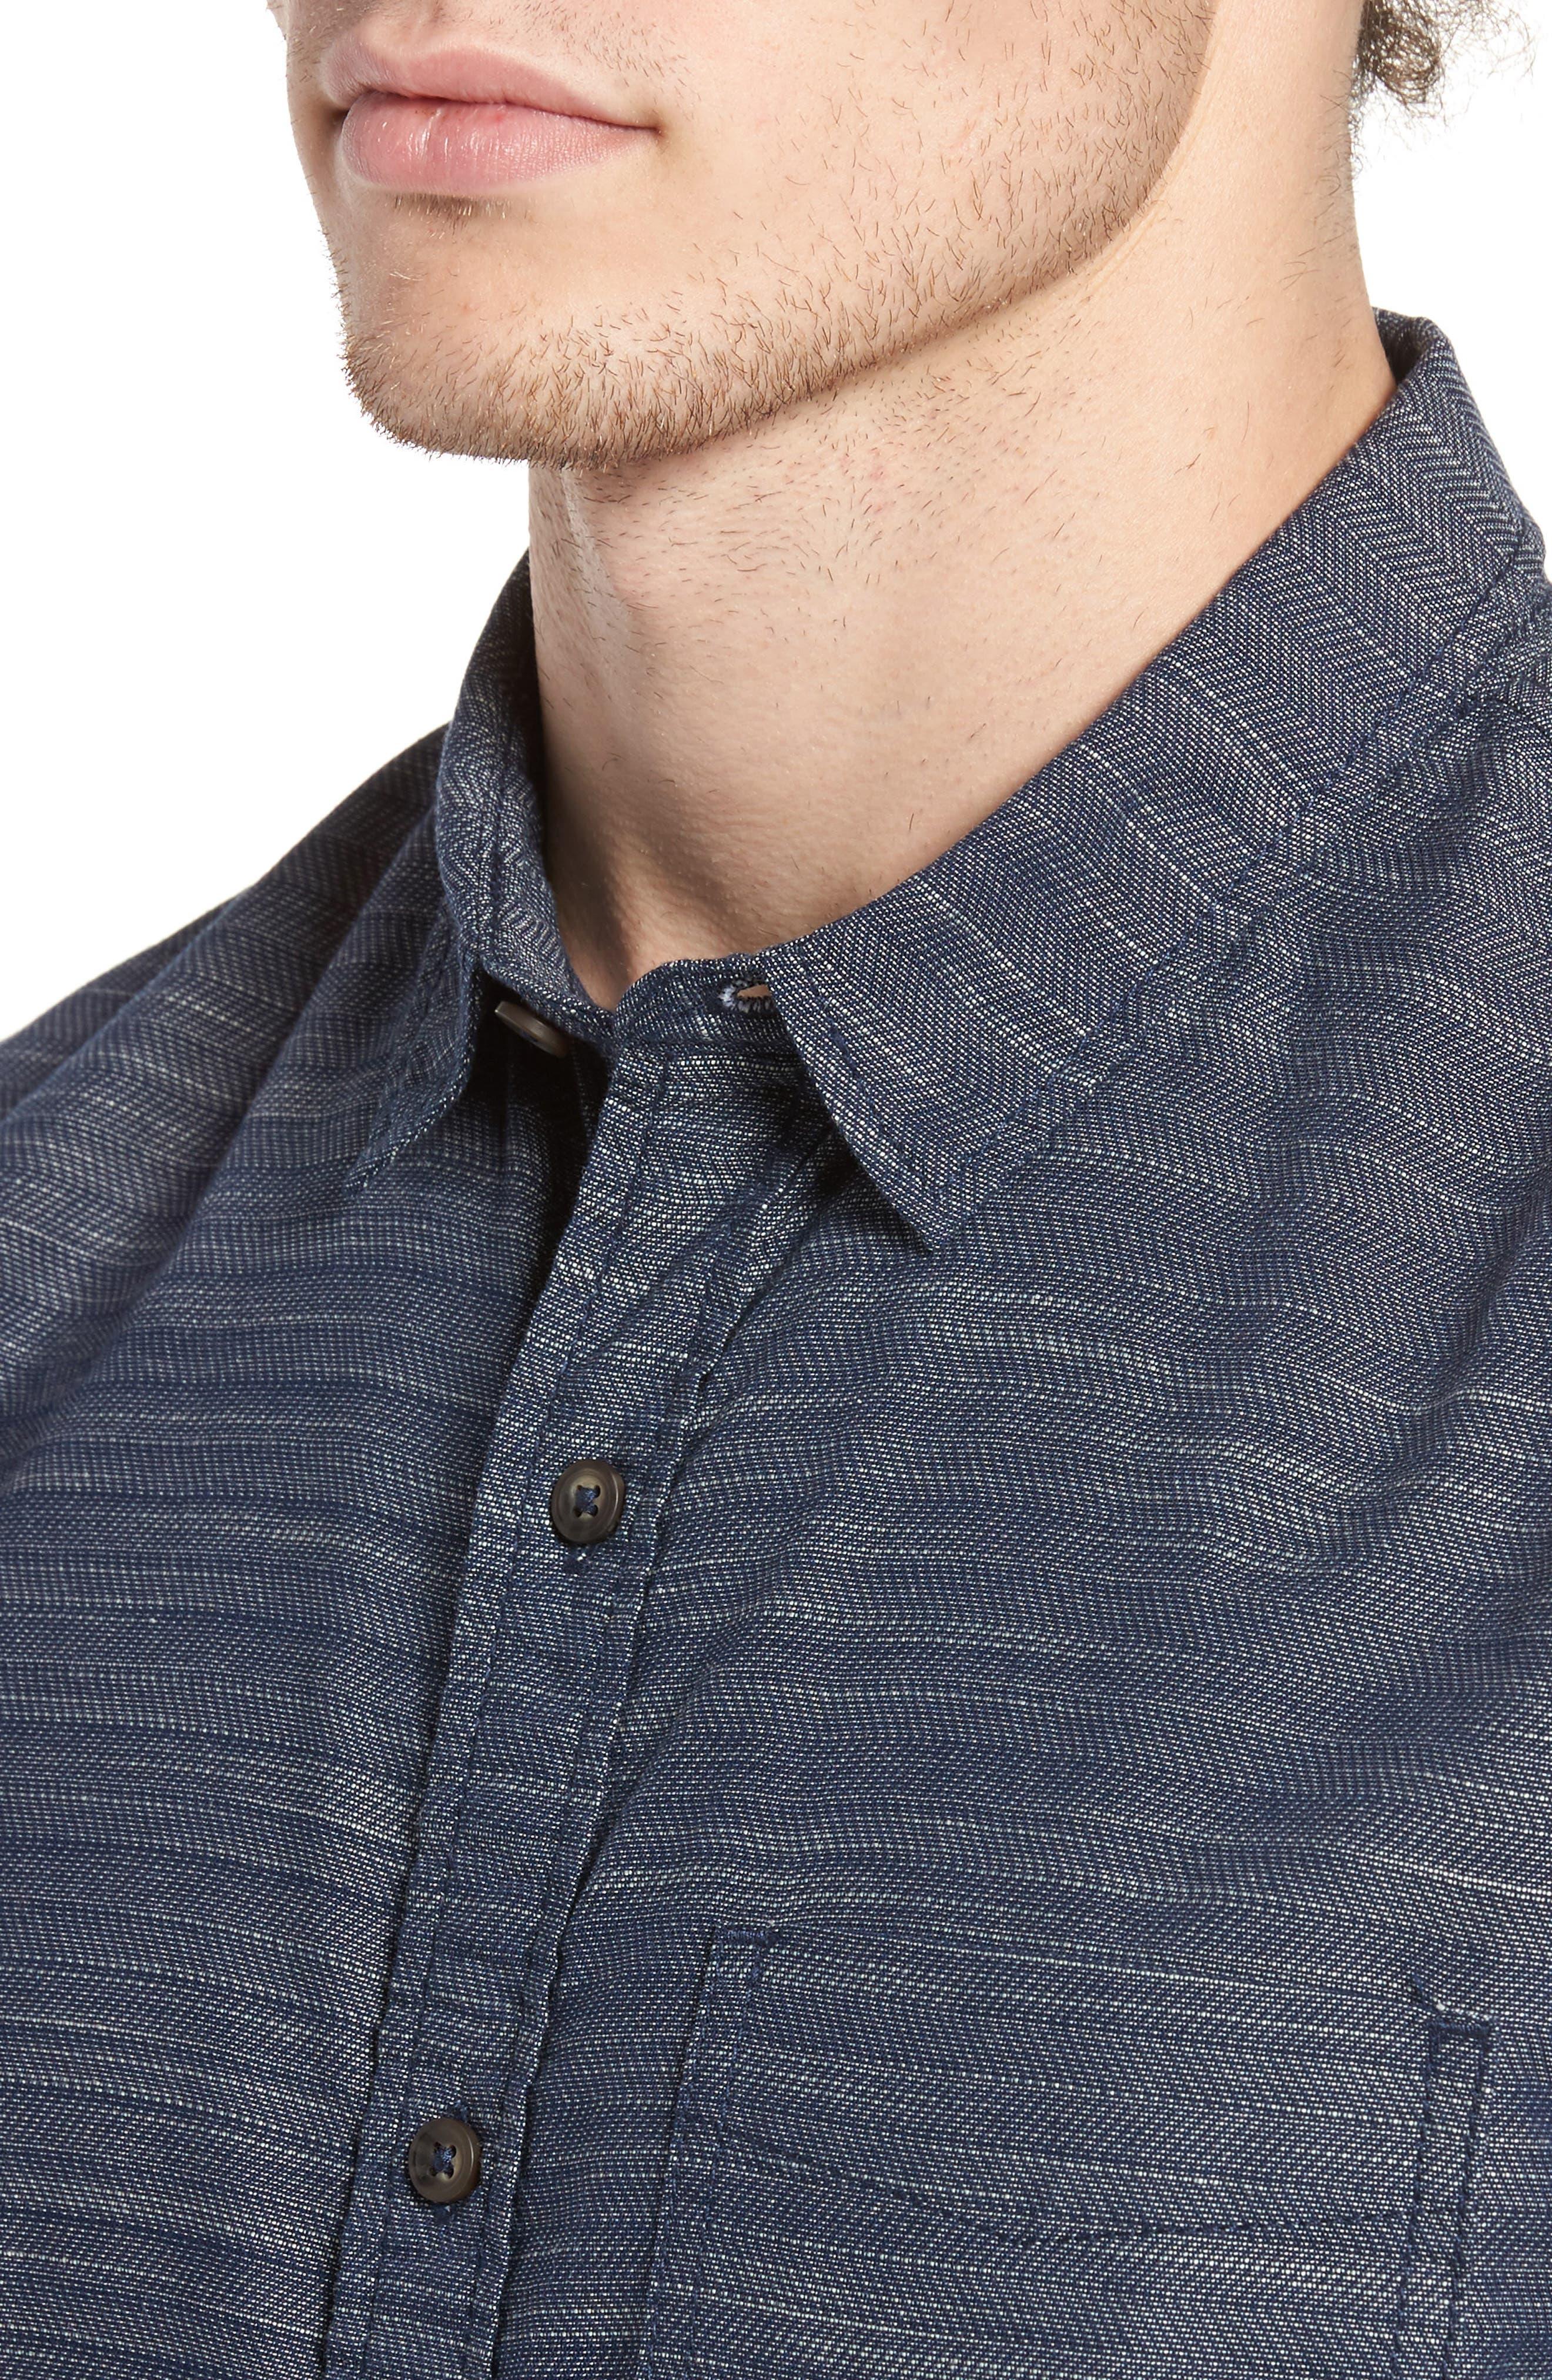 Herringbone Chambray Shirt,                             Alternate thumbnail 4, color,                             Navy Charcoal Herringbone